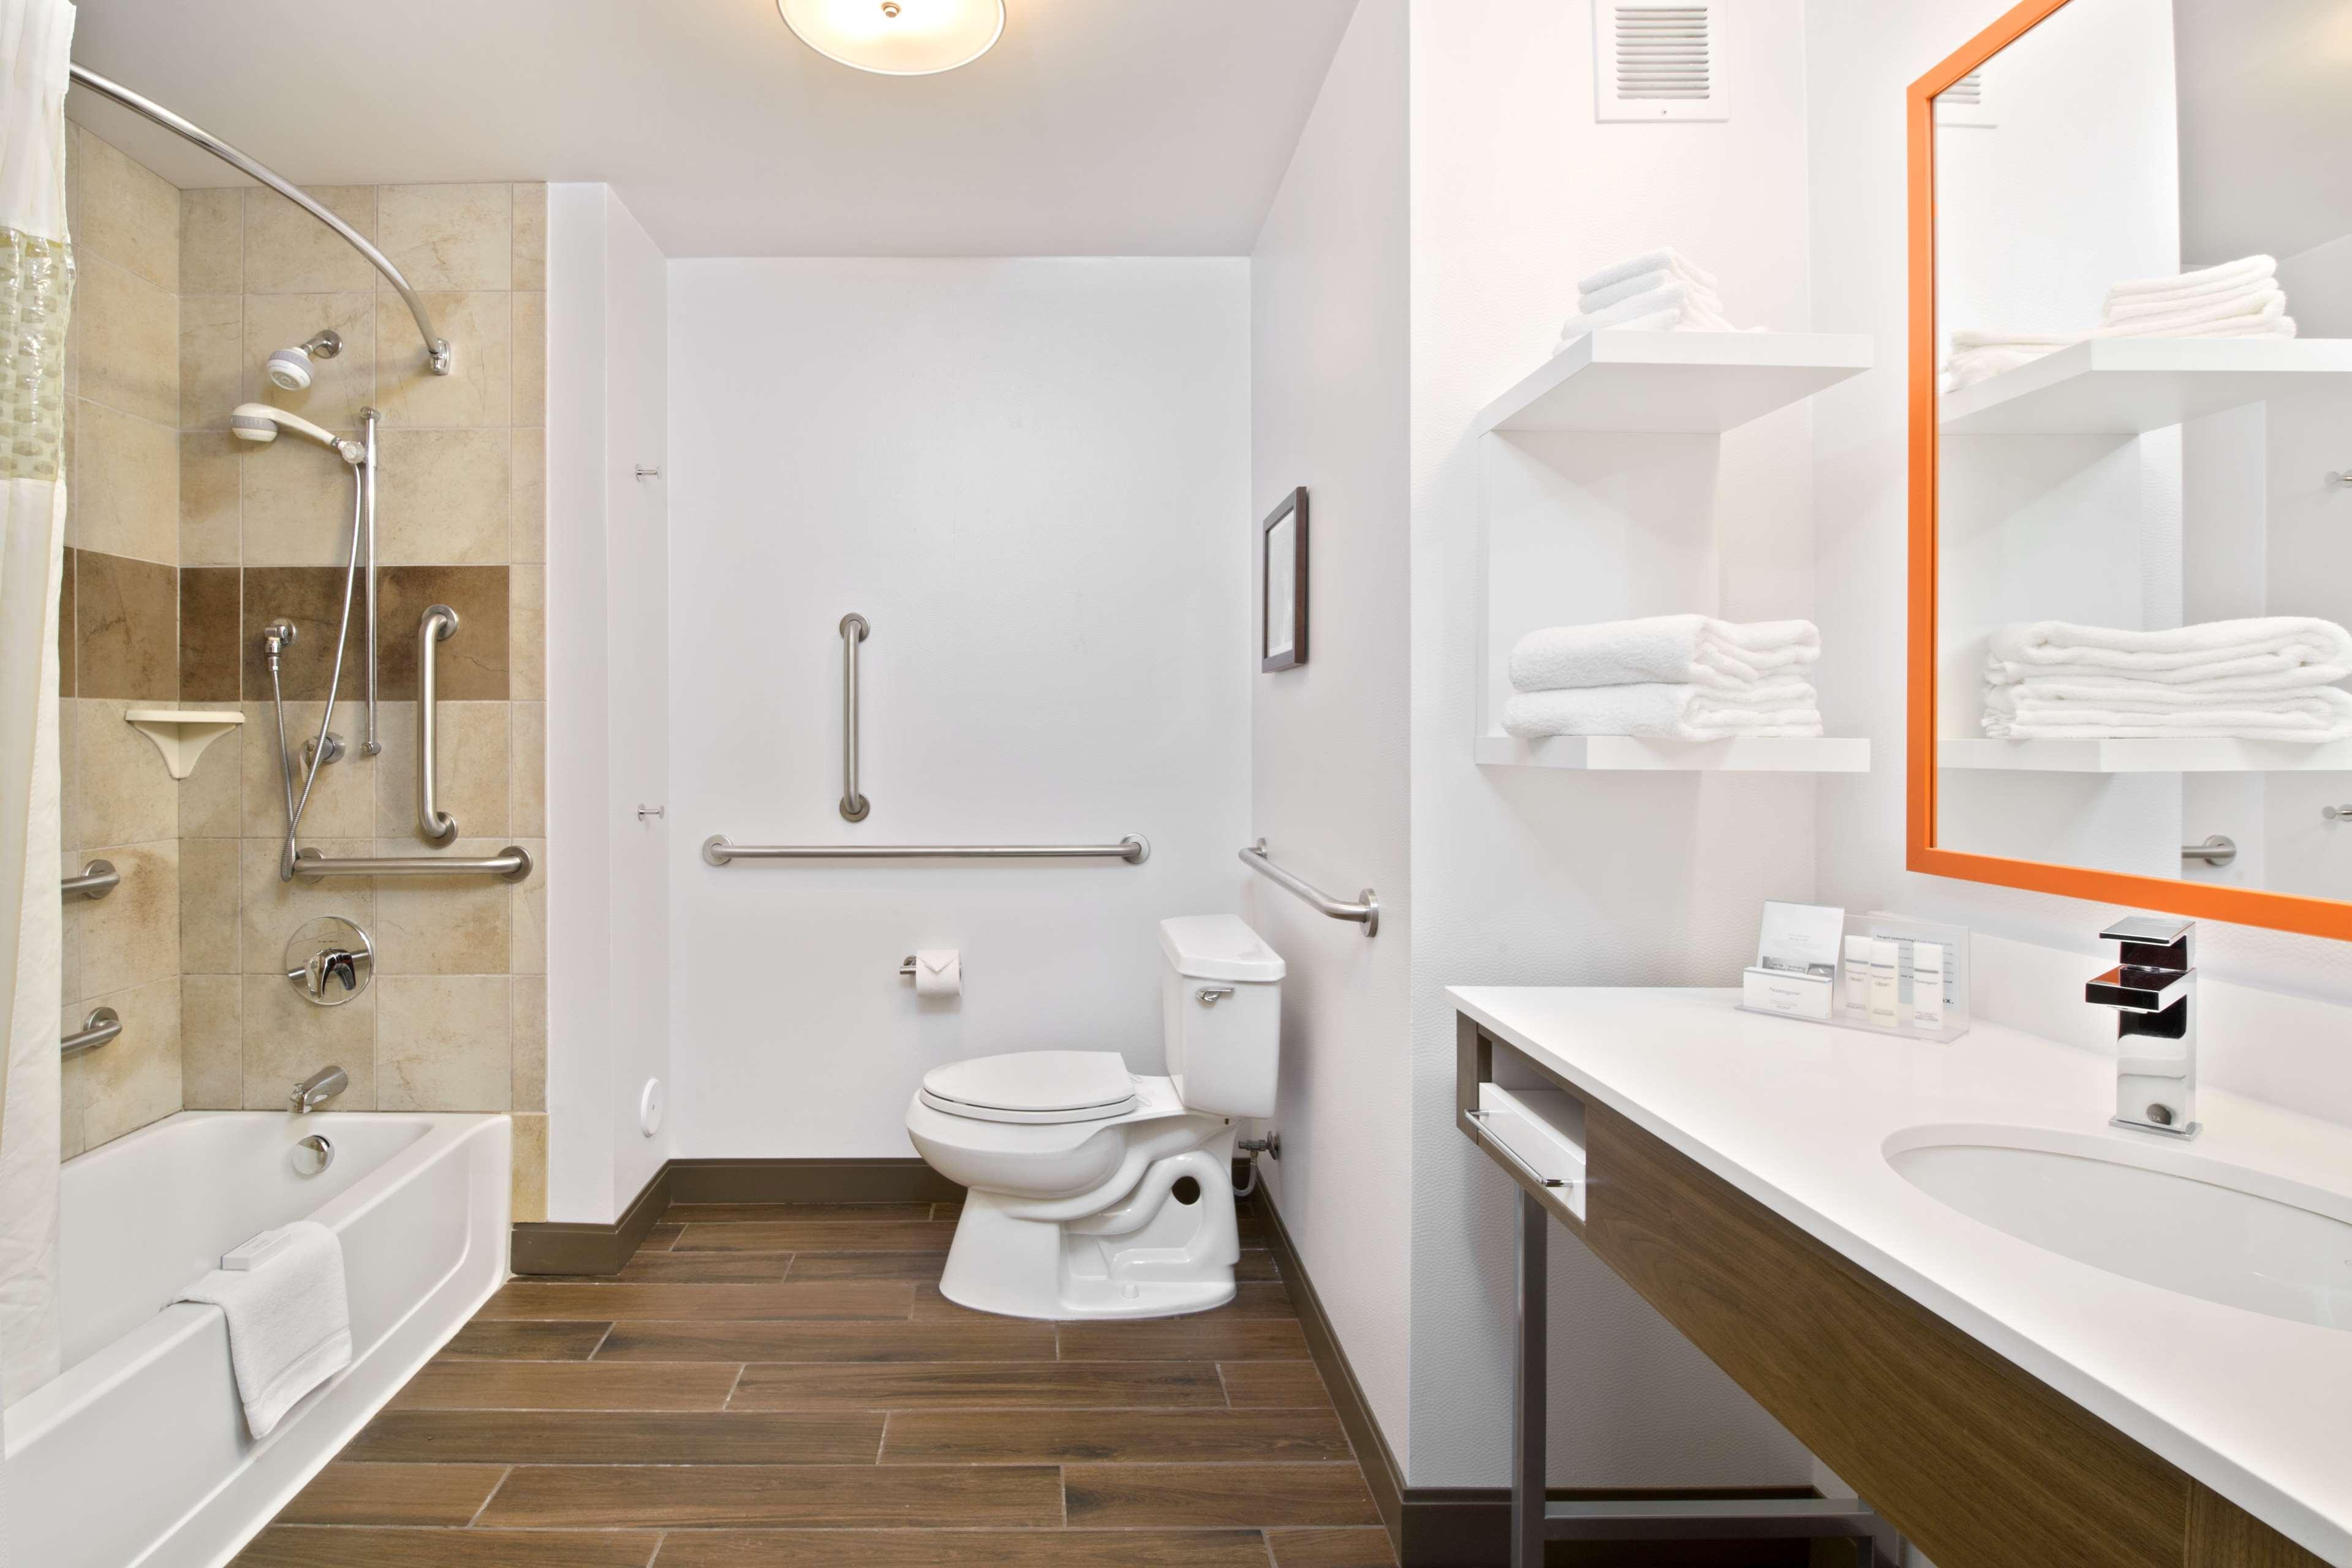 Hampton Inn & Suites Spokane Valley image 30